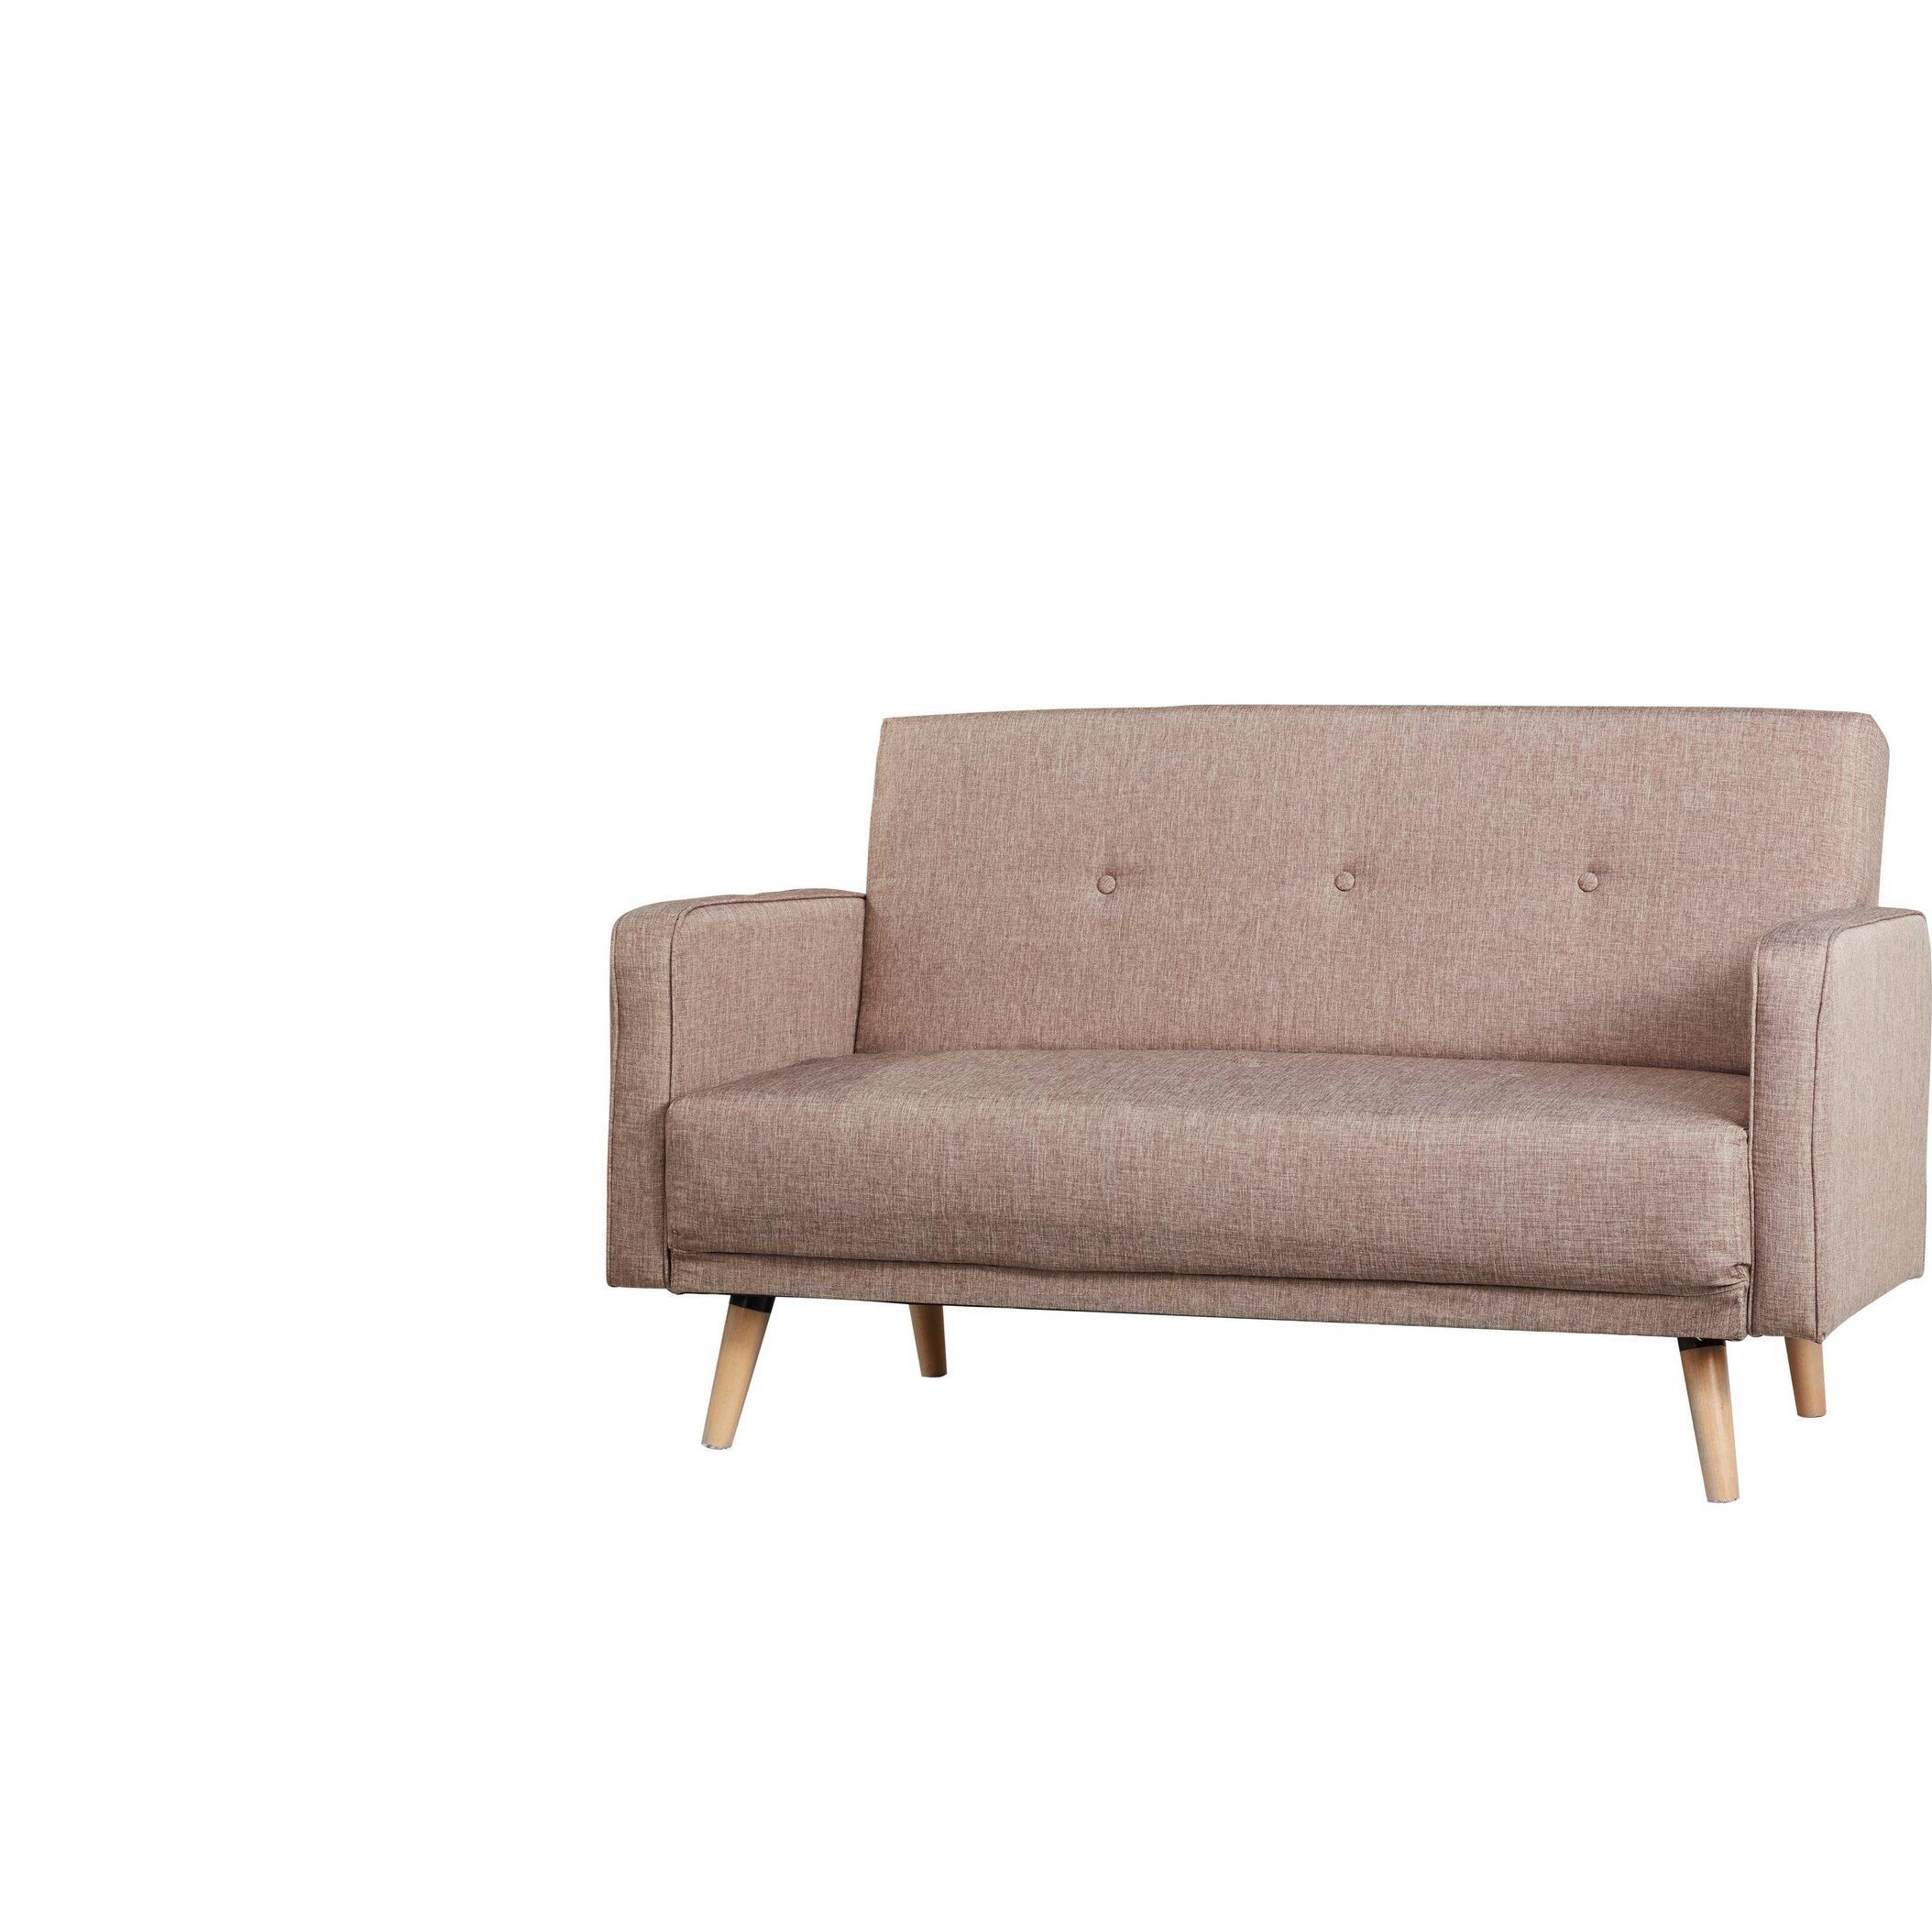 riley ave courtney 2 seater sofa reviews wayfair uk. Black Bedroom Furniture Sets. Home Design Ideas